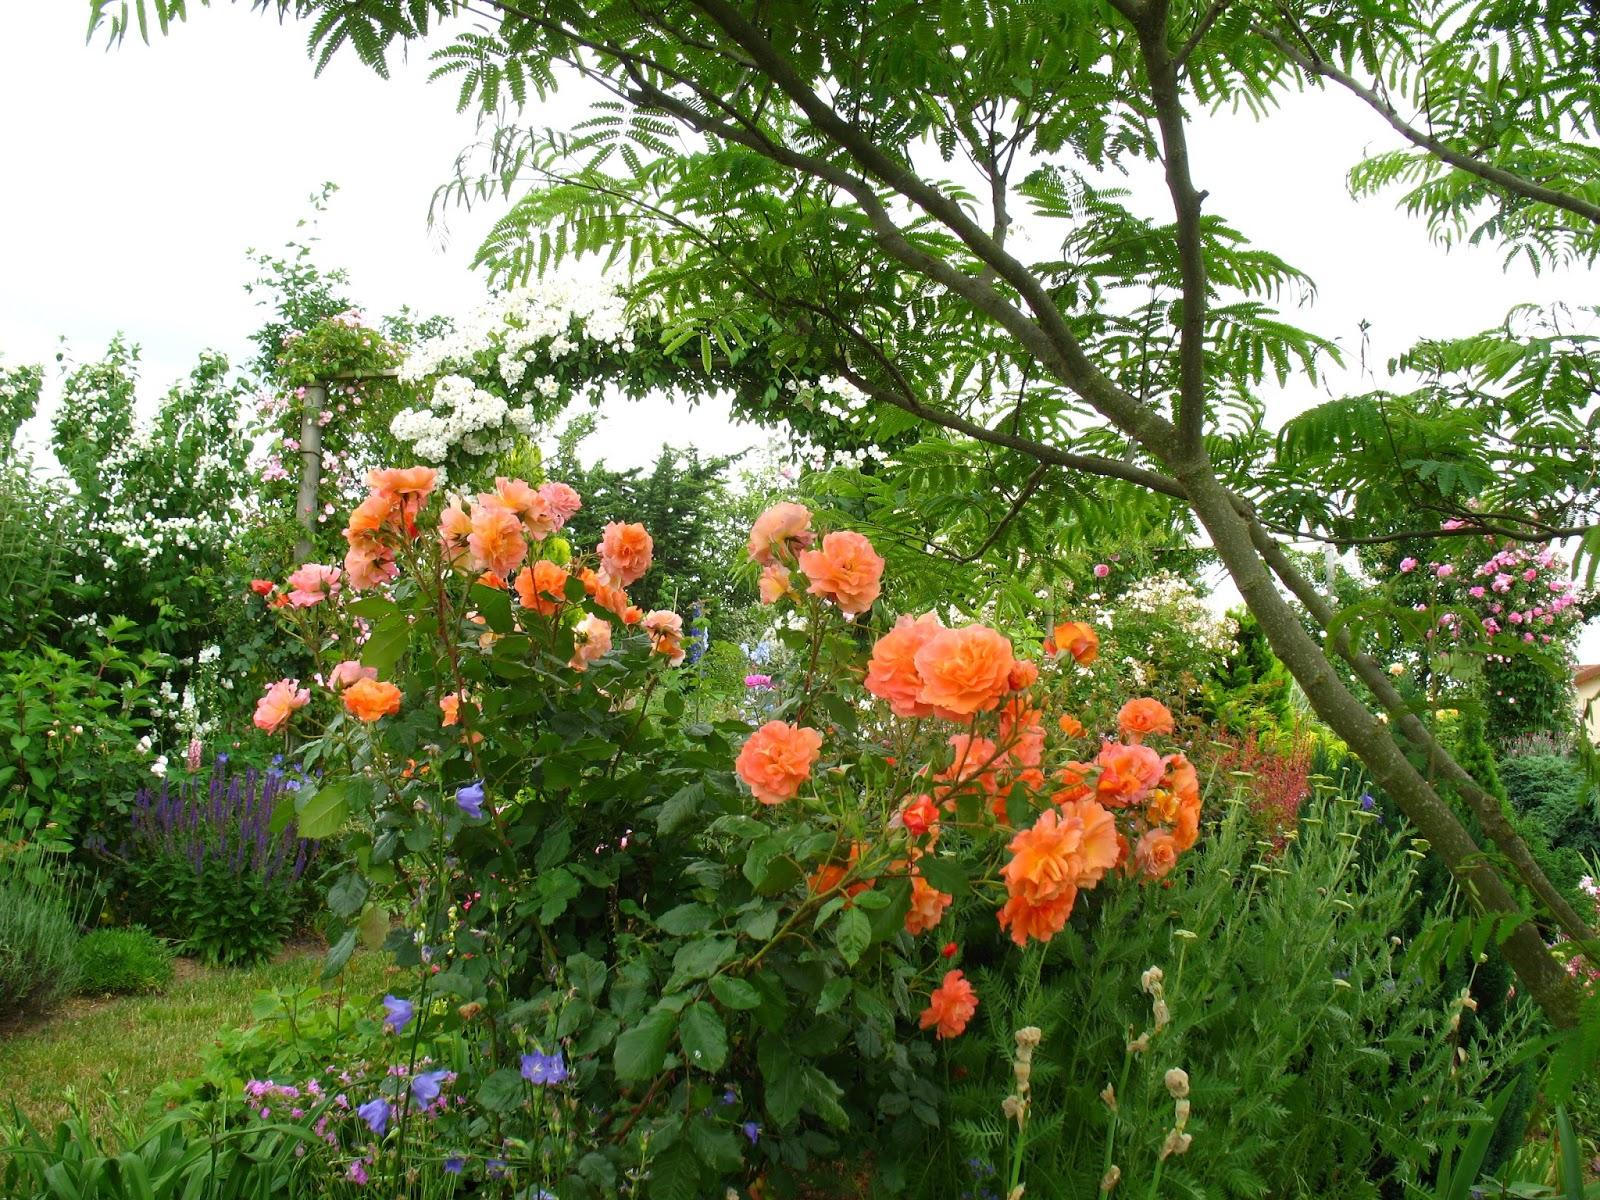 roses du jardin ch neland rosier westerland apr s les frimas de l 39 hiver 2012. Black Bedroom Furniture Sets. Home Design Ideas